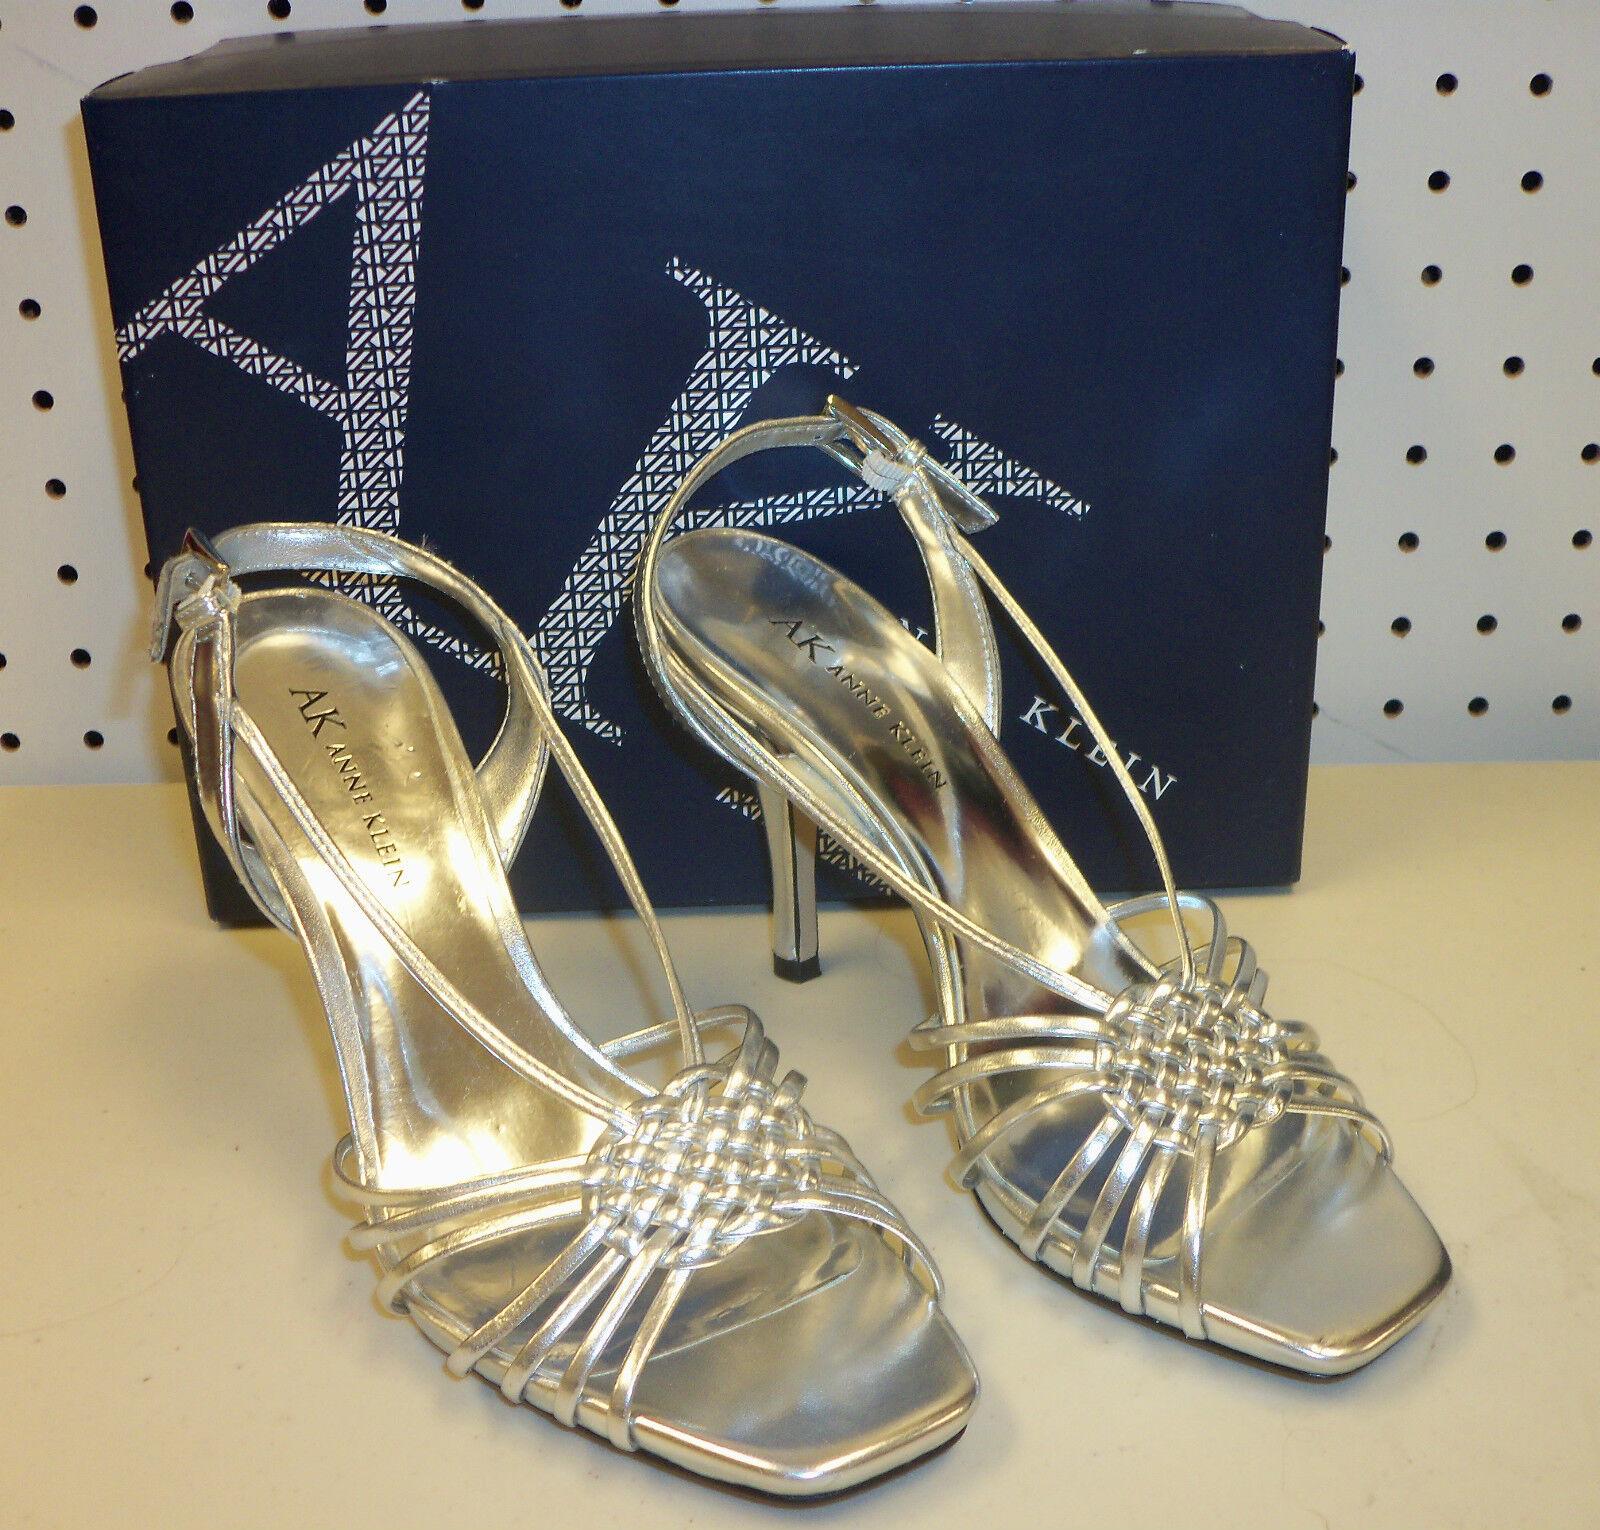 Anne Klein New New Klein Womens Aplik Silver Strappy Slingbacks 6.5 M Heels Shoes ad971c